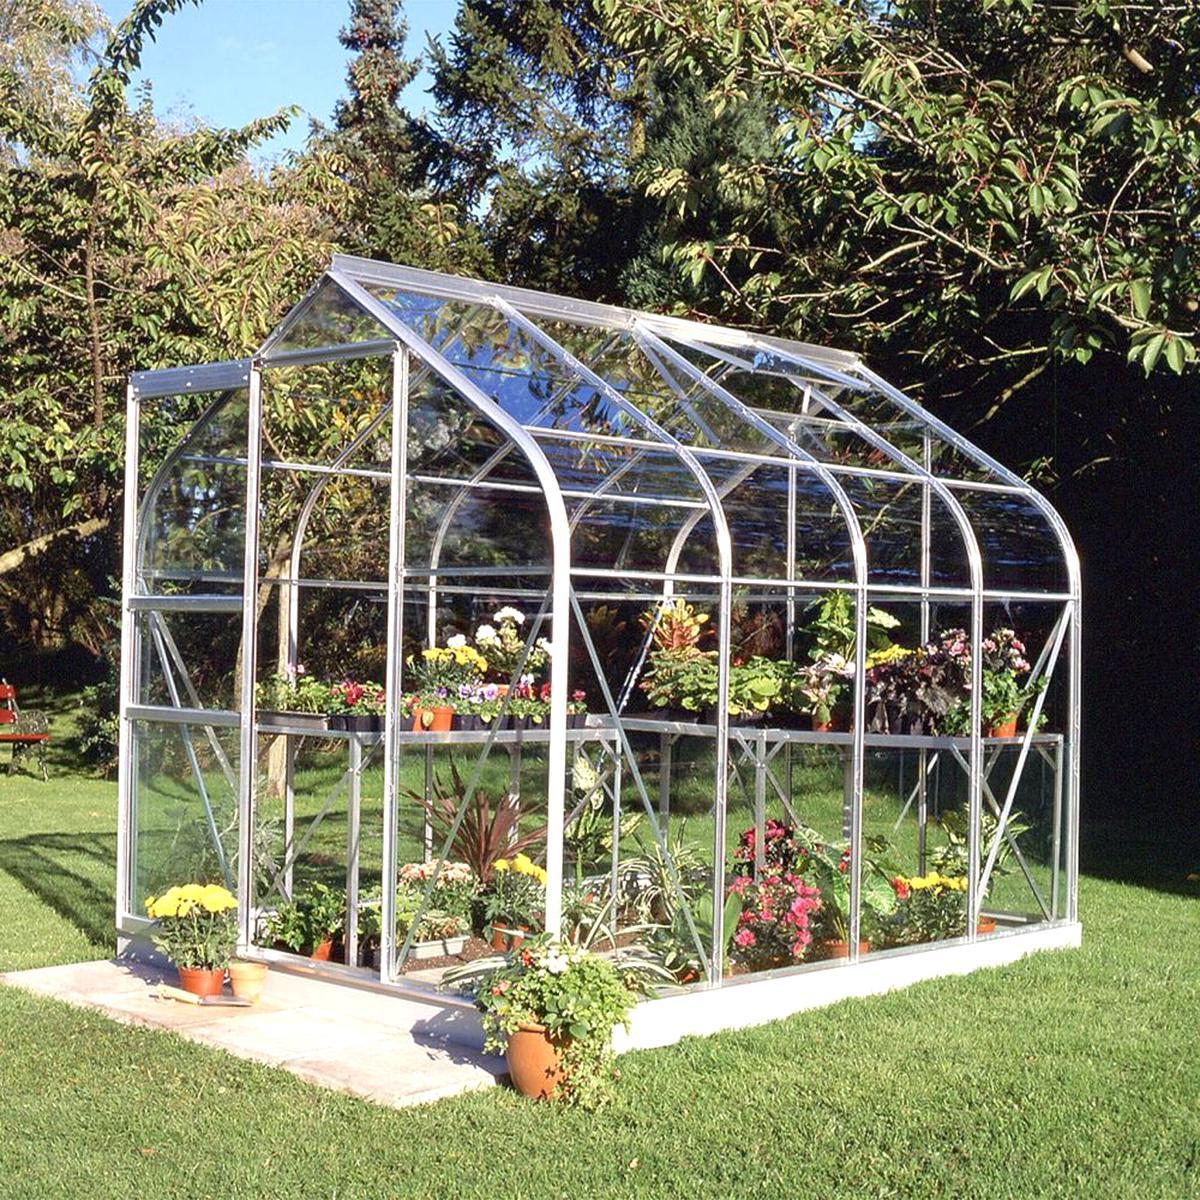 Serre Horticole Verre D'occasion avec Serre De Jardin Occasion